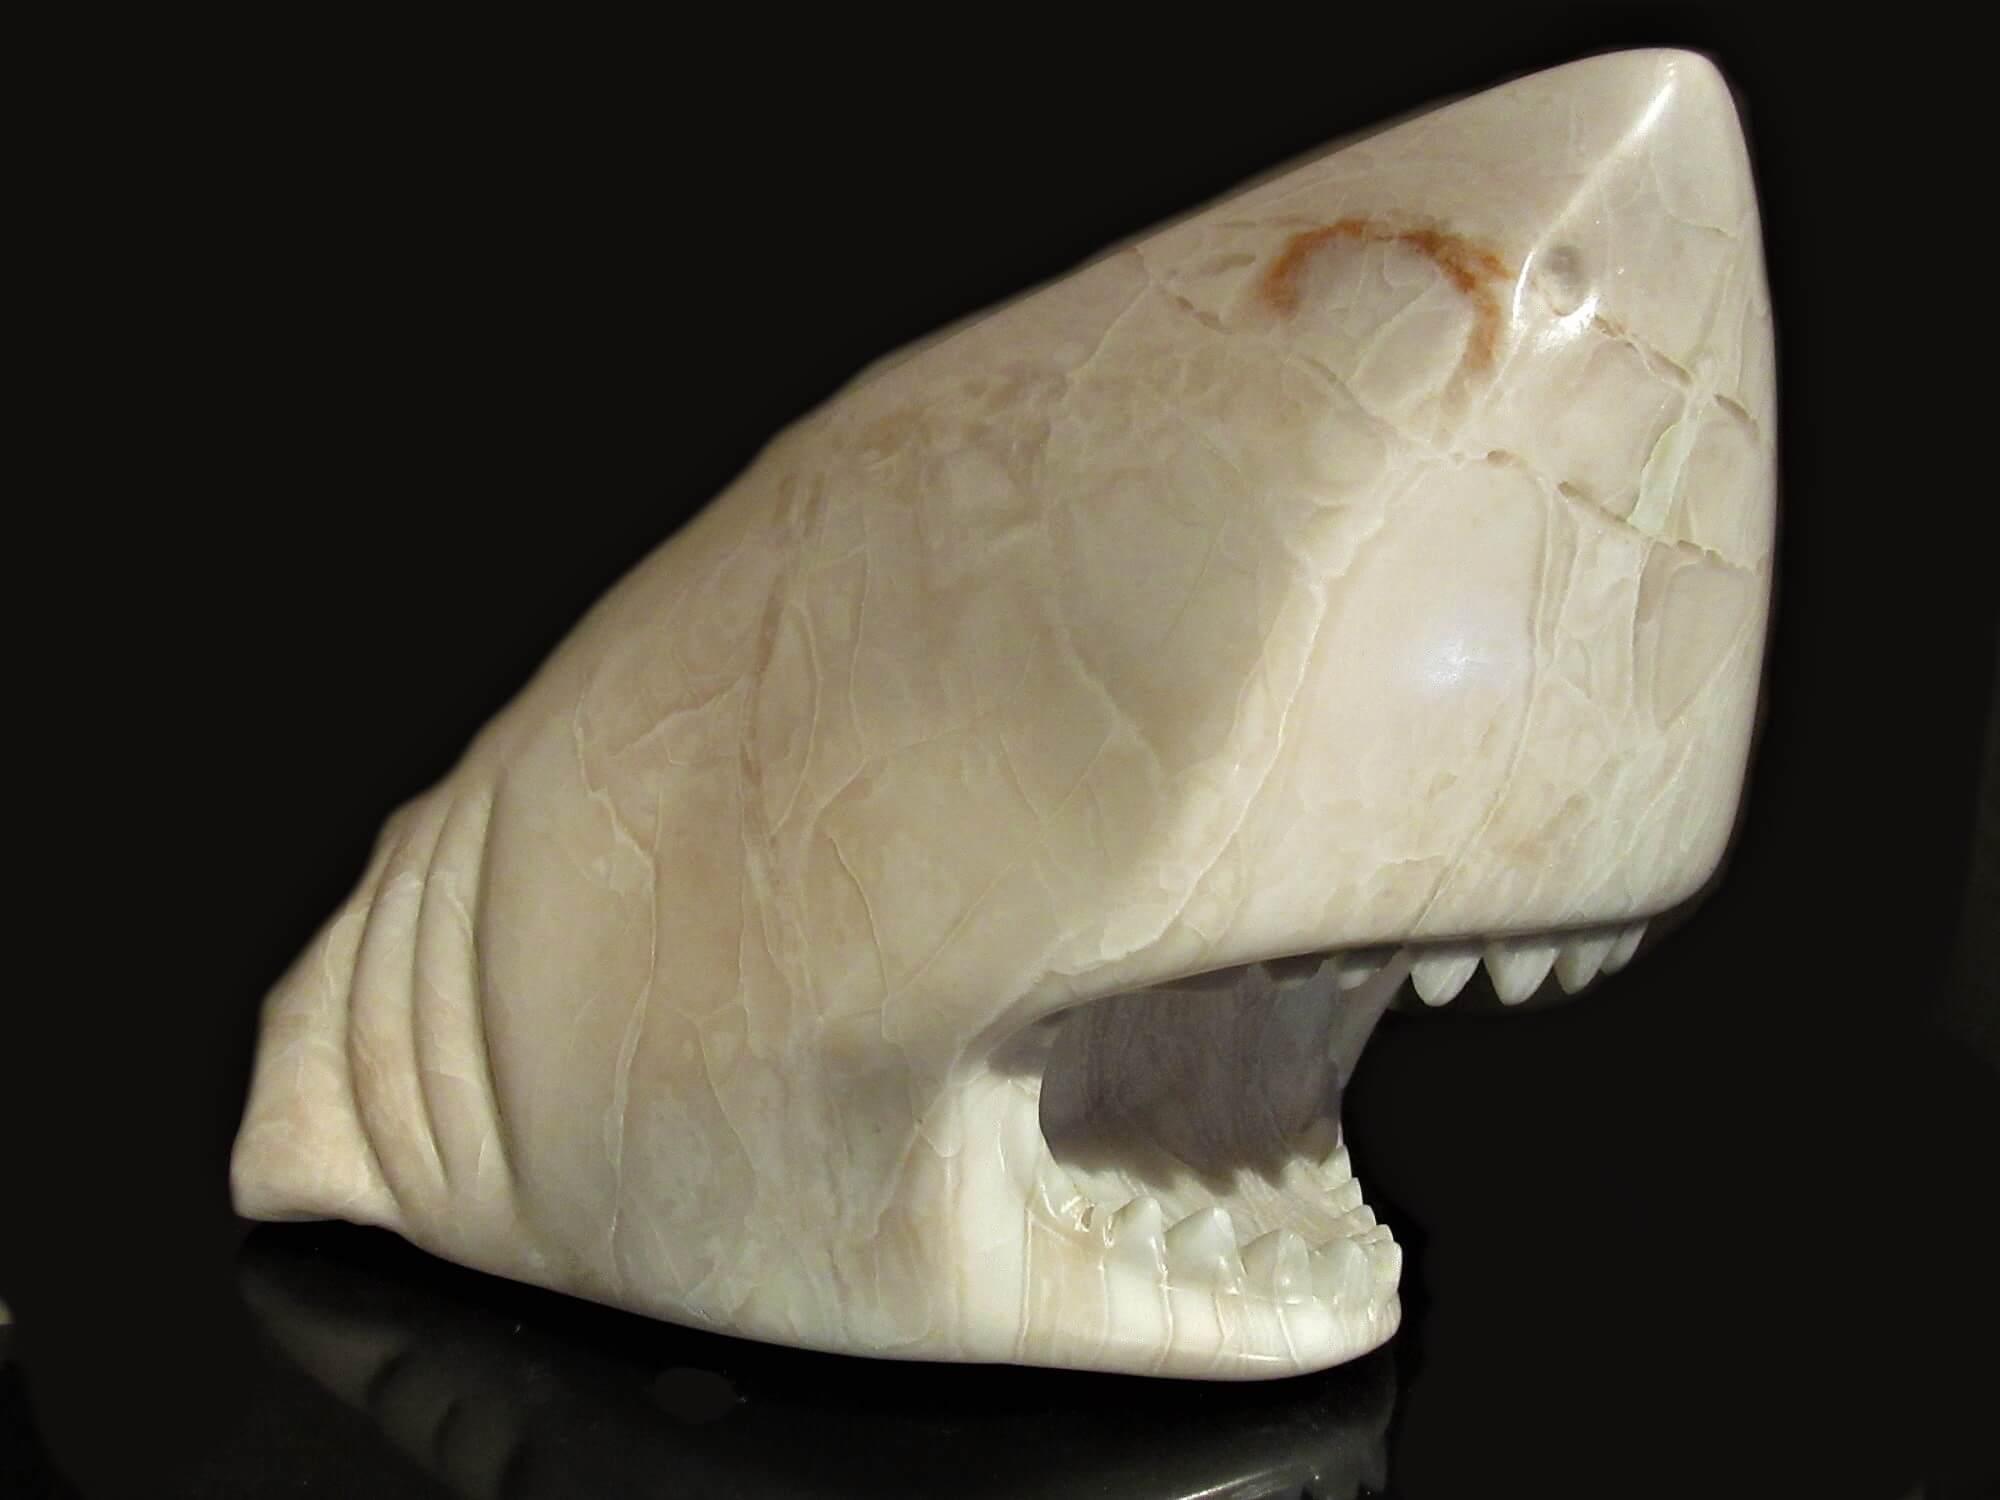 Alan Rhody Arts – Handcrafted Stone Sculpture